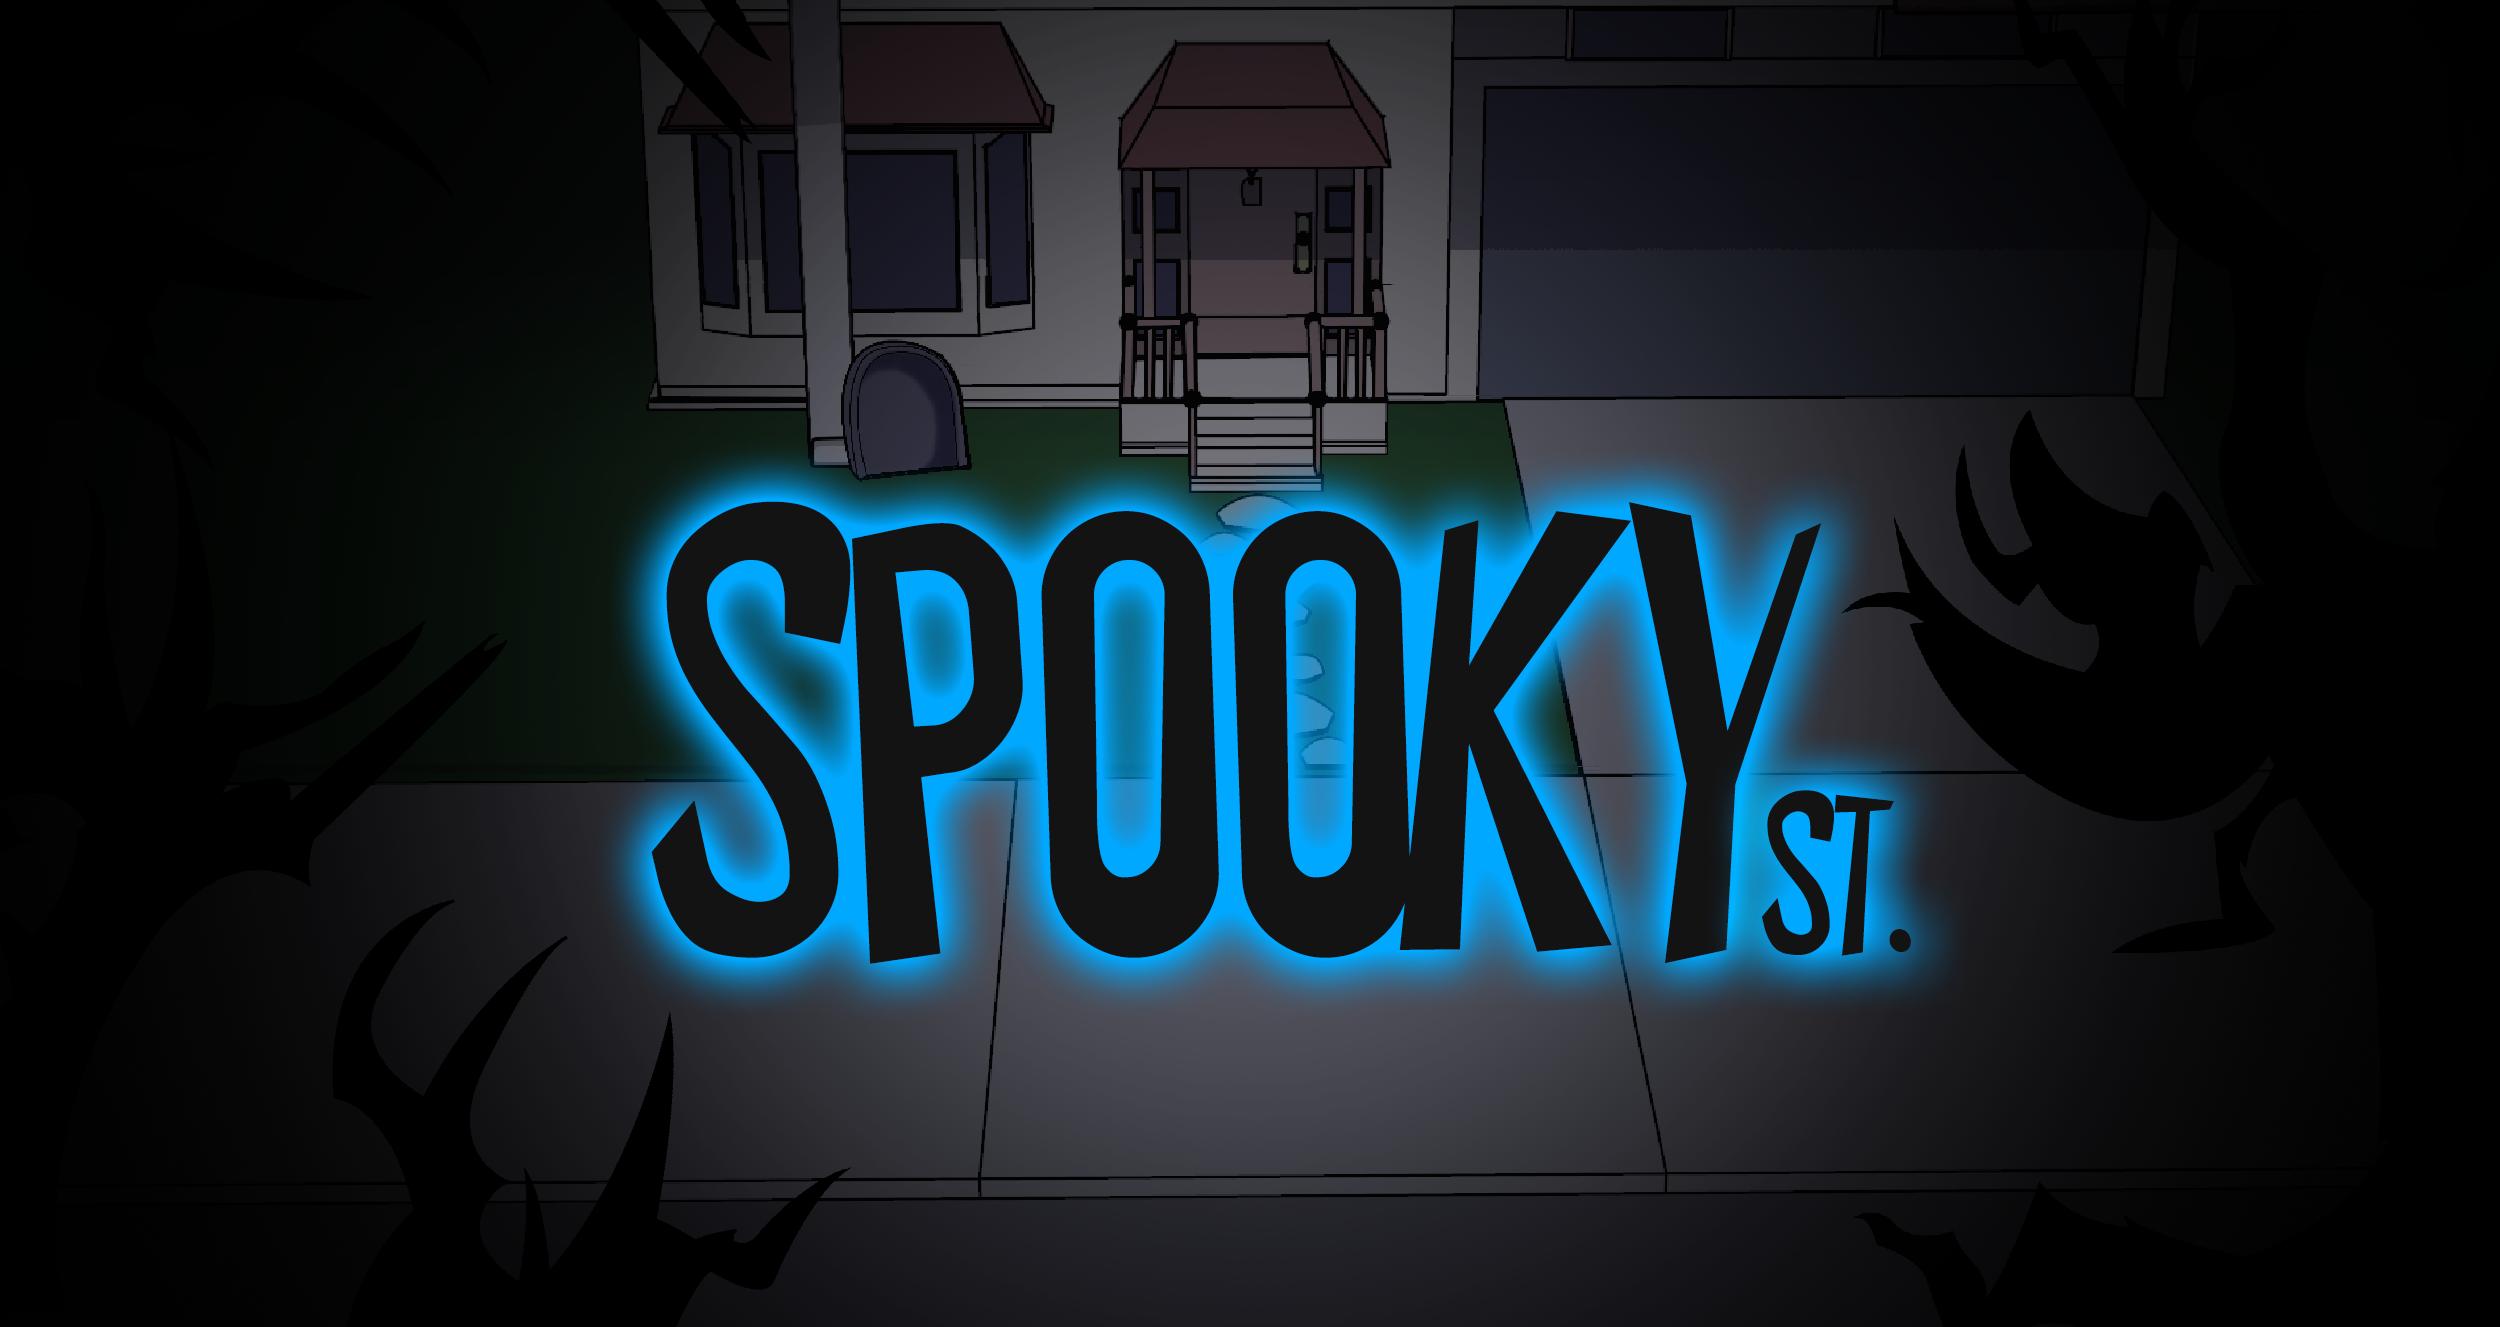 Spooky St.